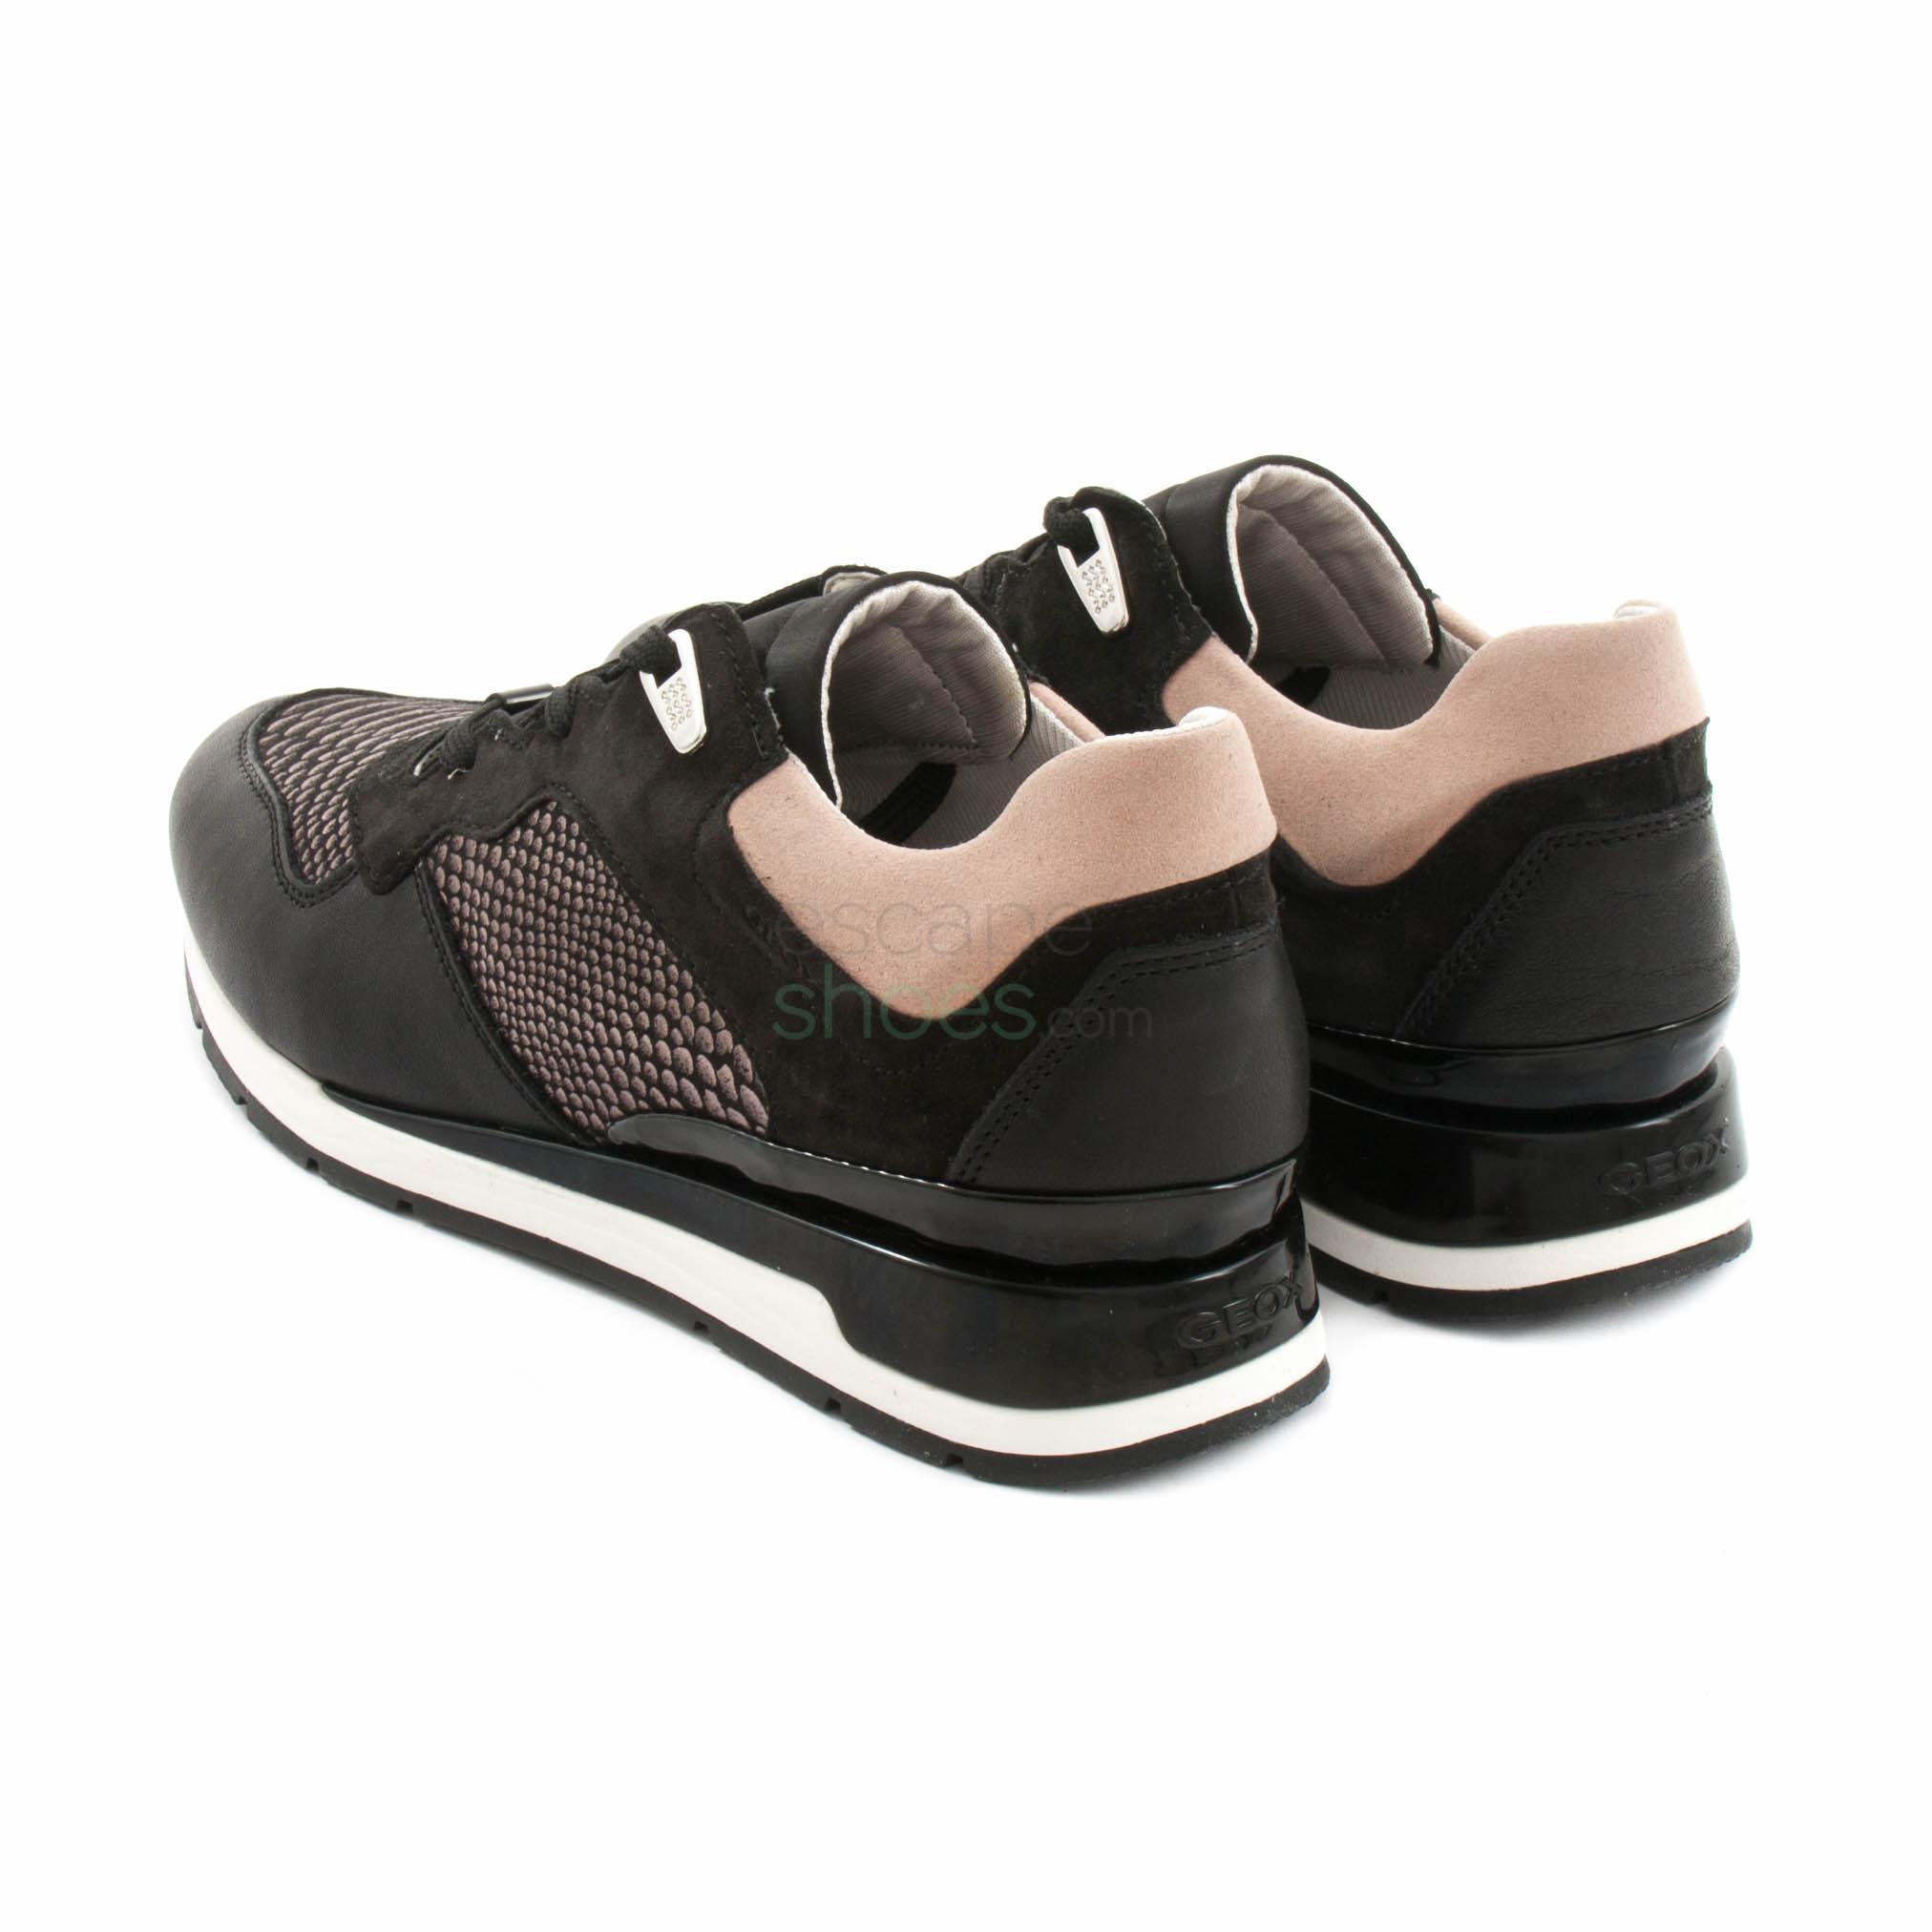 Sneakers GEOX Shahira Black